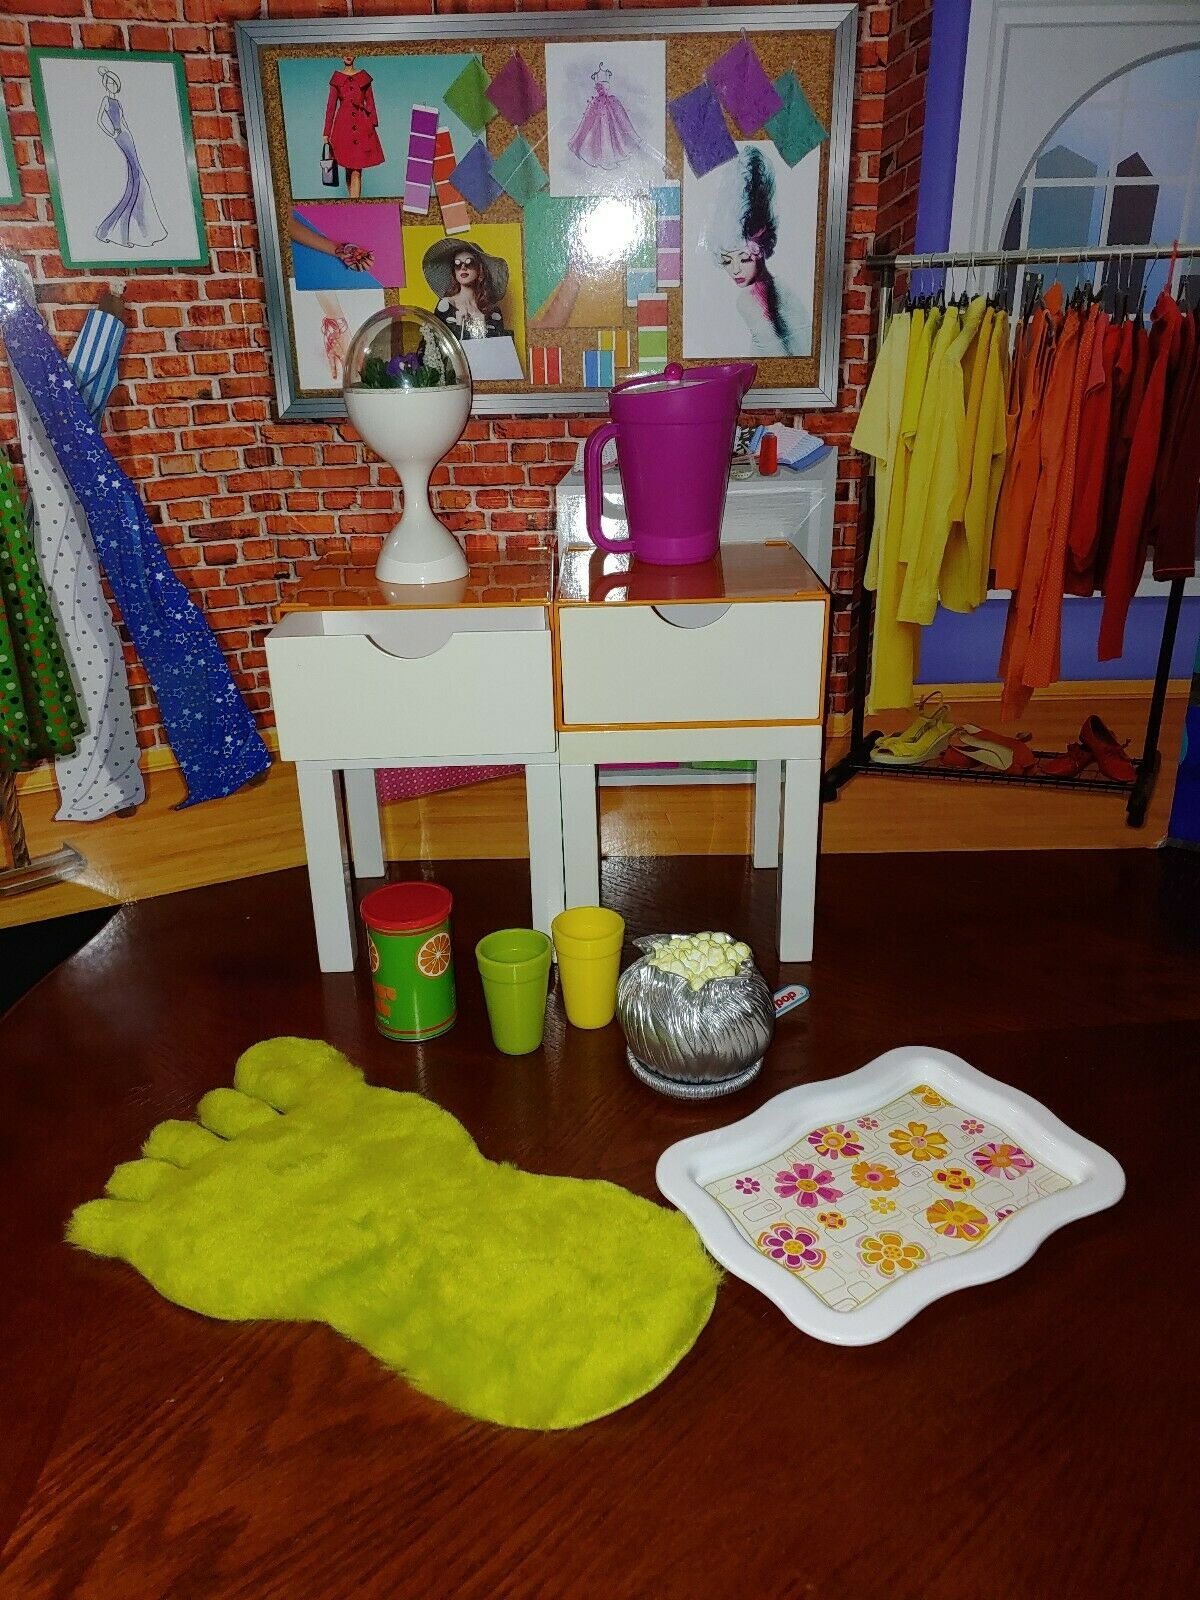 American Girl JULIE'S BEDROOM Accessories - Gently Used EUC